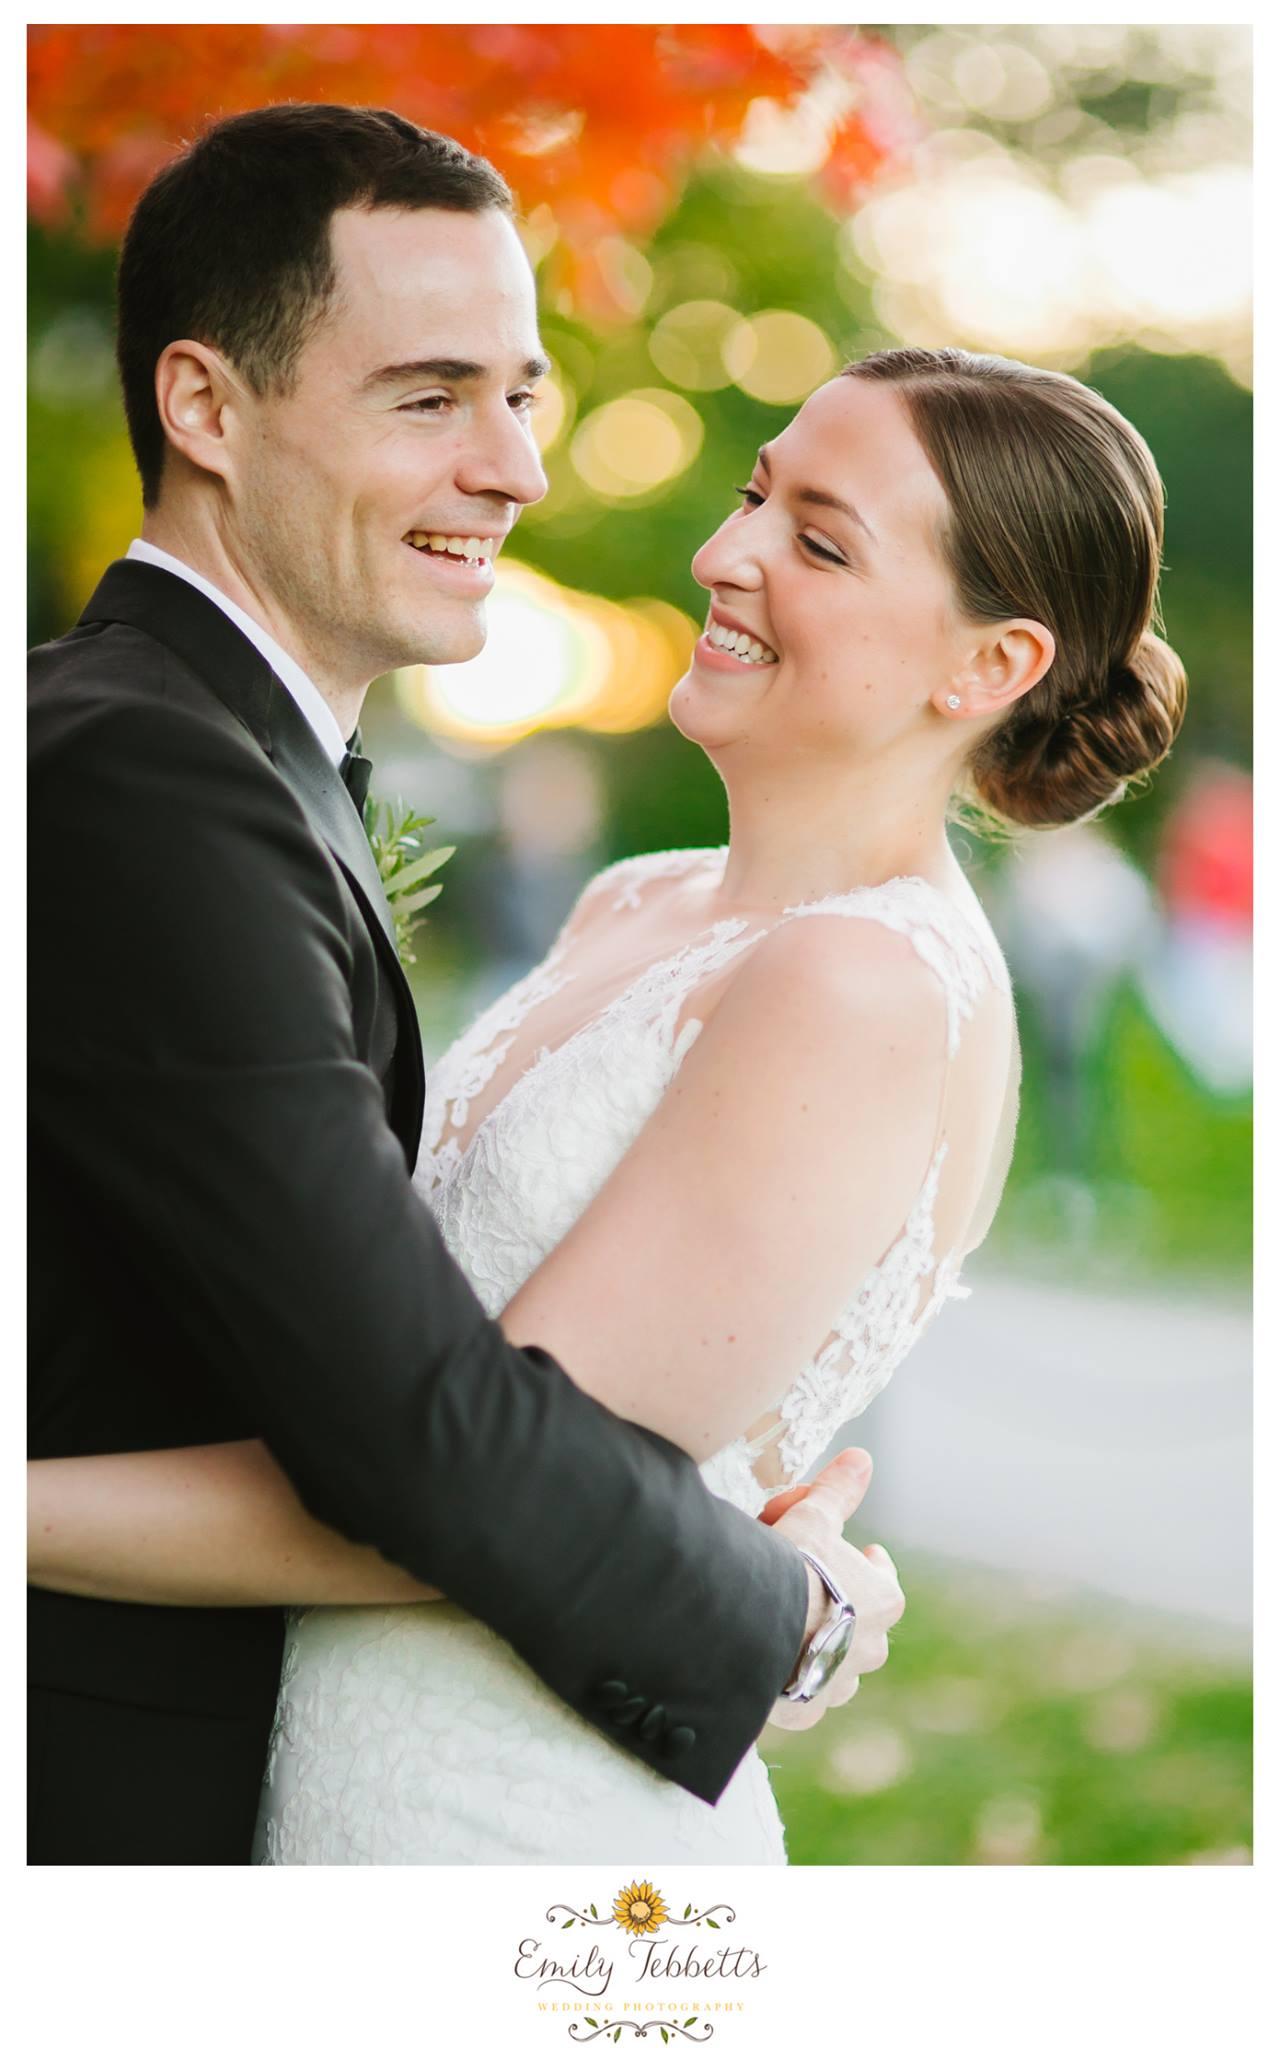 Boston, MA - Emily Tebbetts Wedding Photography 9.jpg